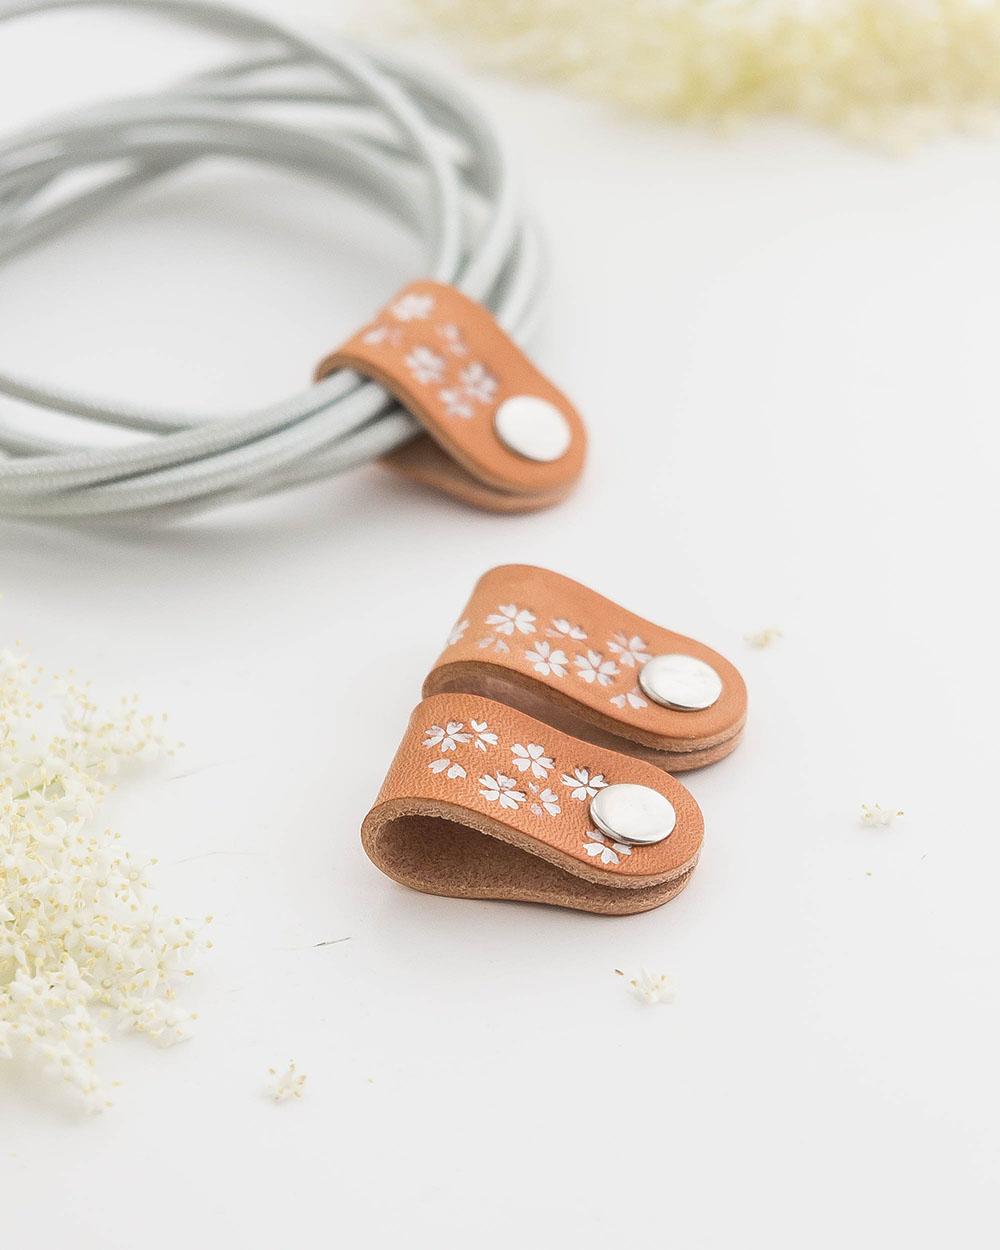 3er-Set Kabelhalter mit Sakura Weiß Blumenmotiv | Sakura flowers Cableholder 3 pieces white